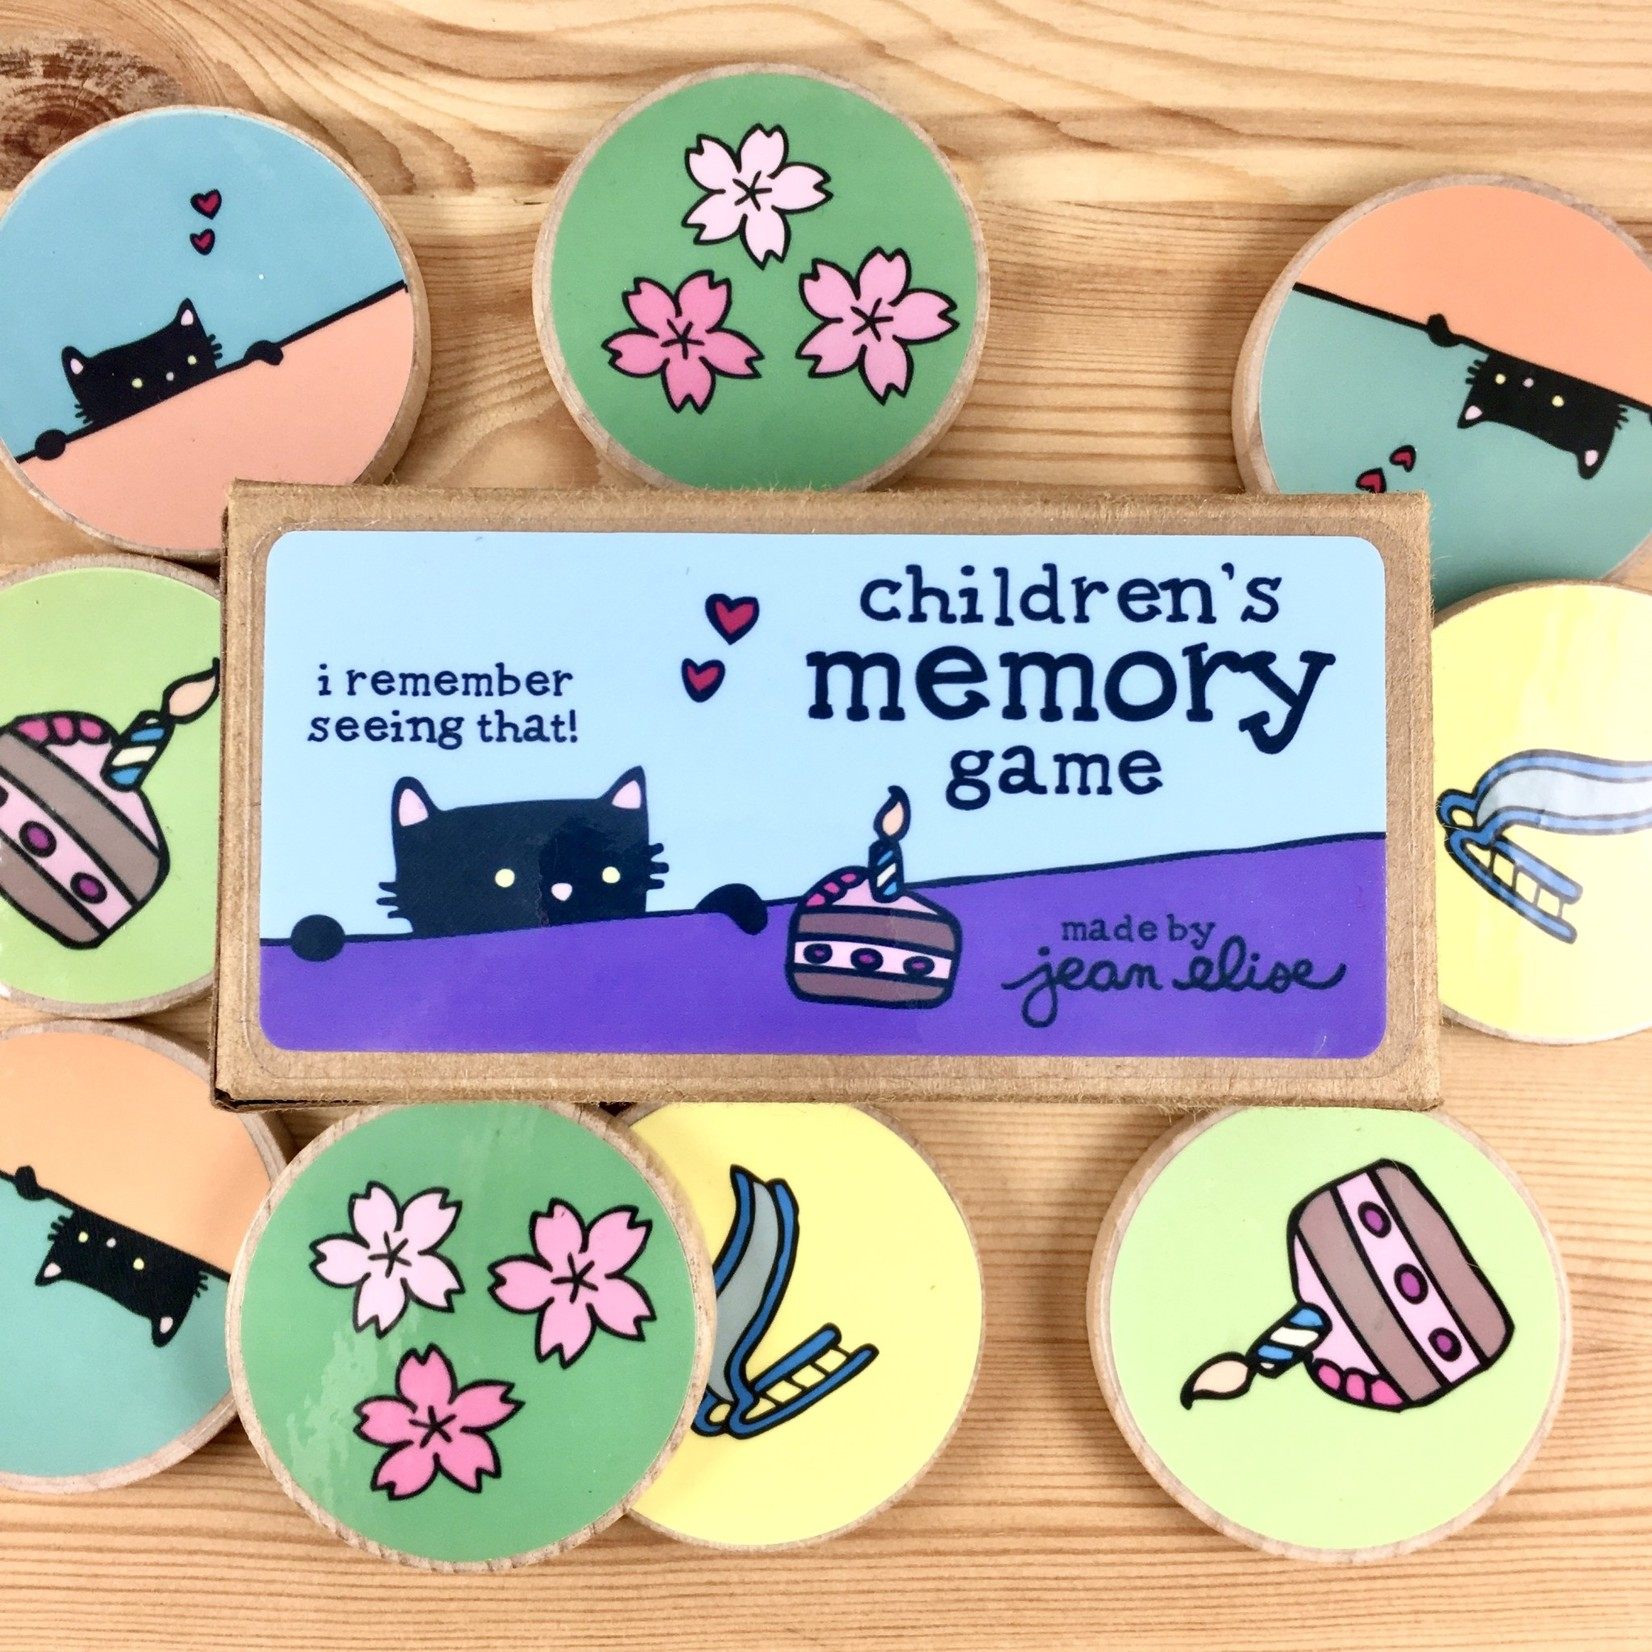 Jean Elise Designs Children's Memory Game